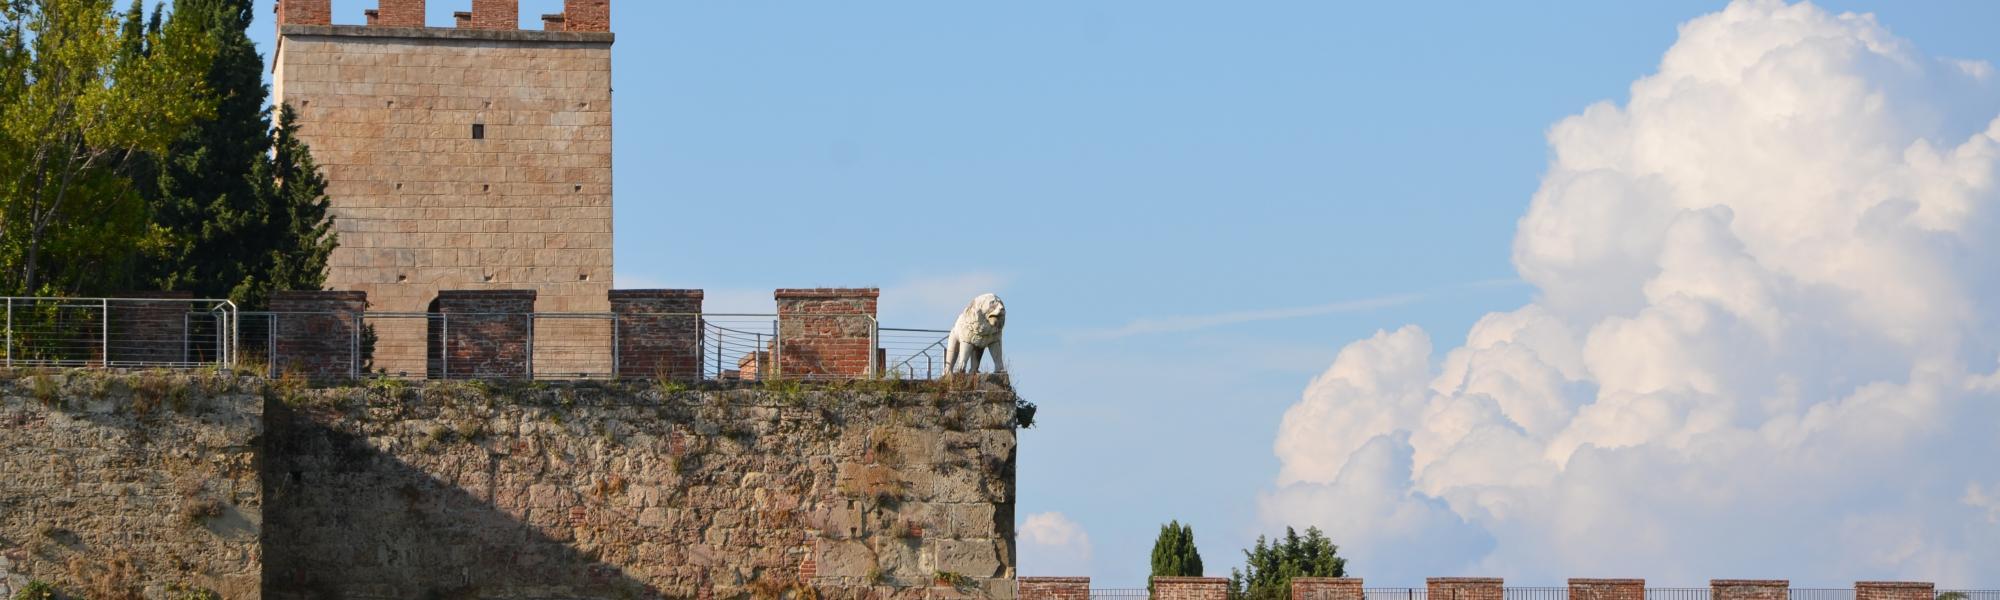 Scorcio Torre Santa Maria (L. Corevi, Comune di Pisa)